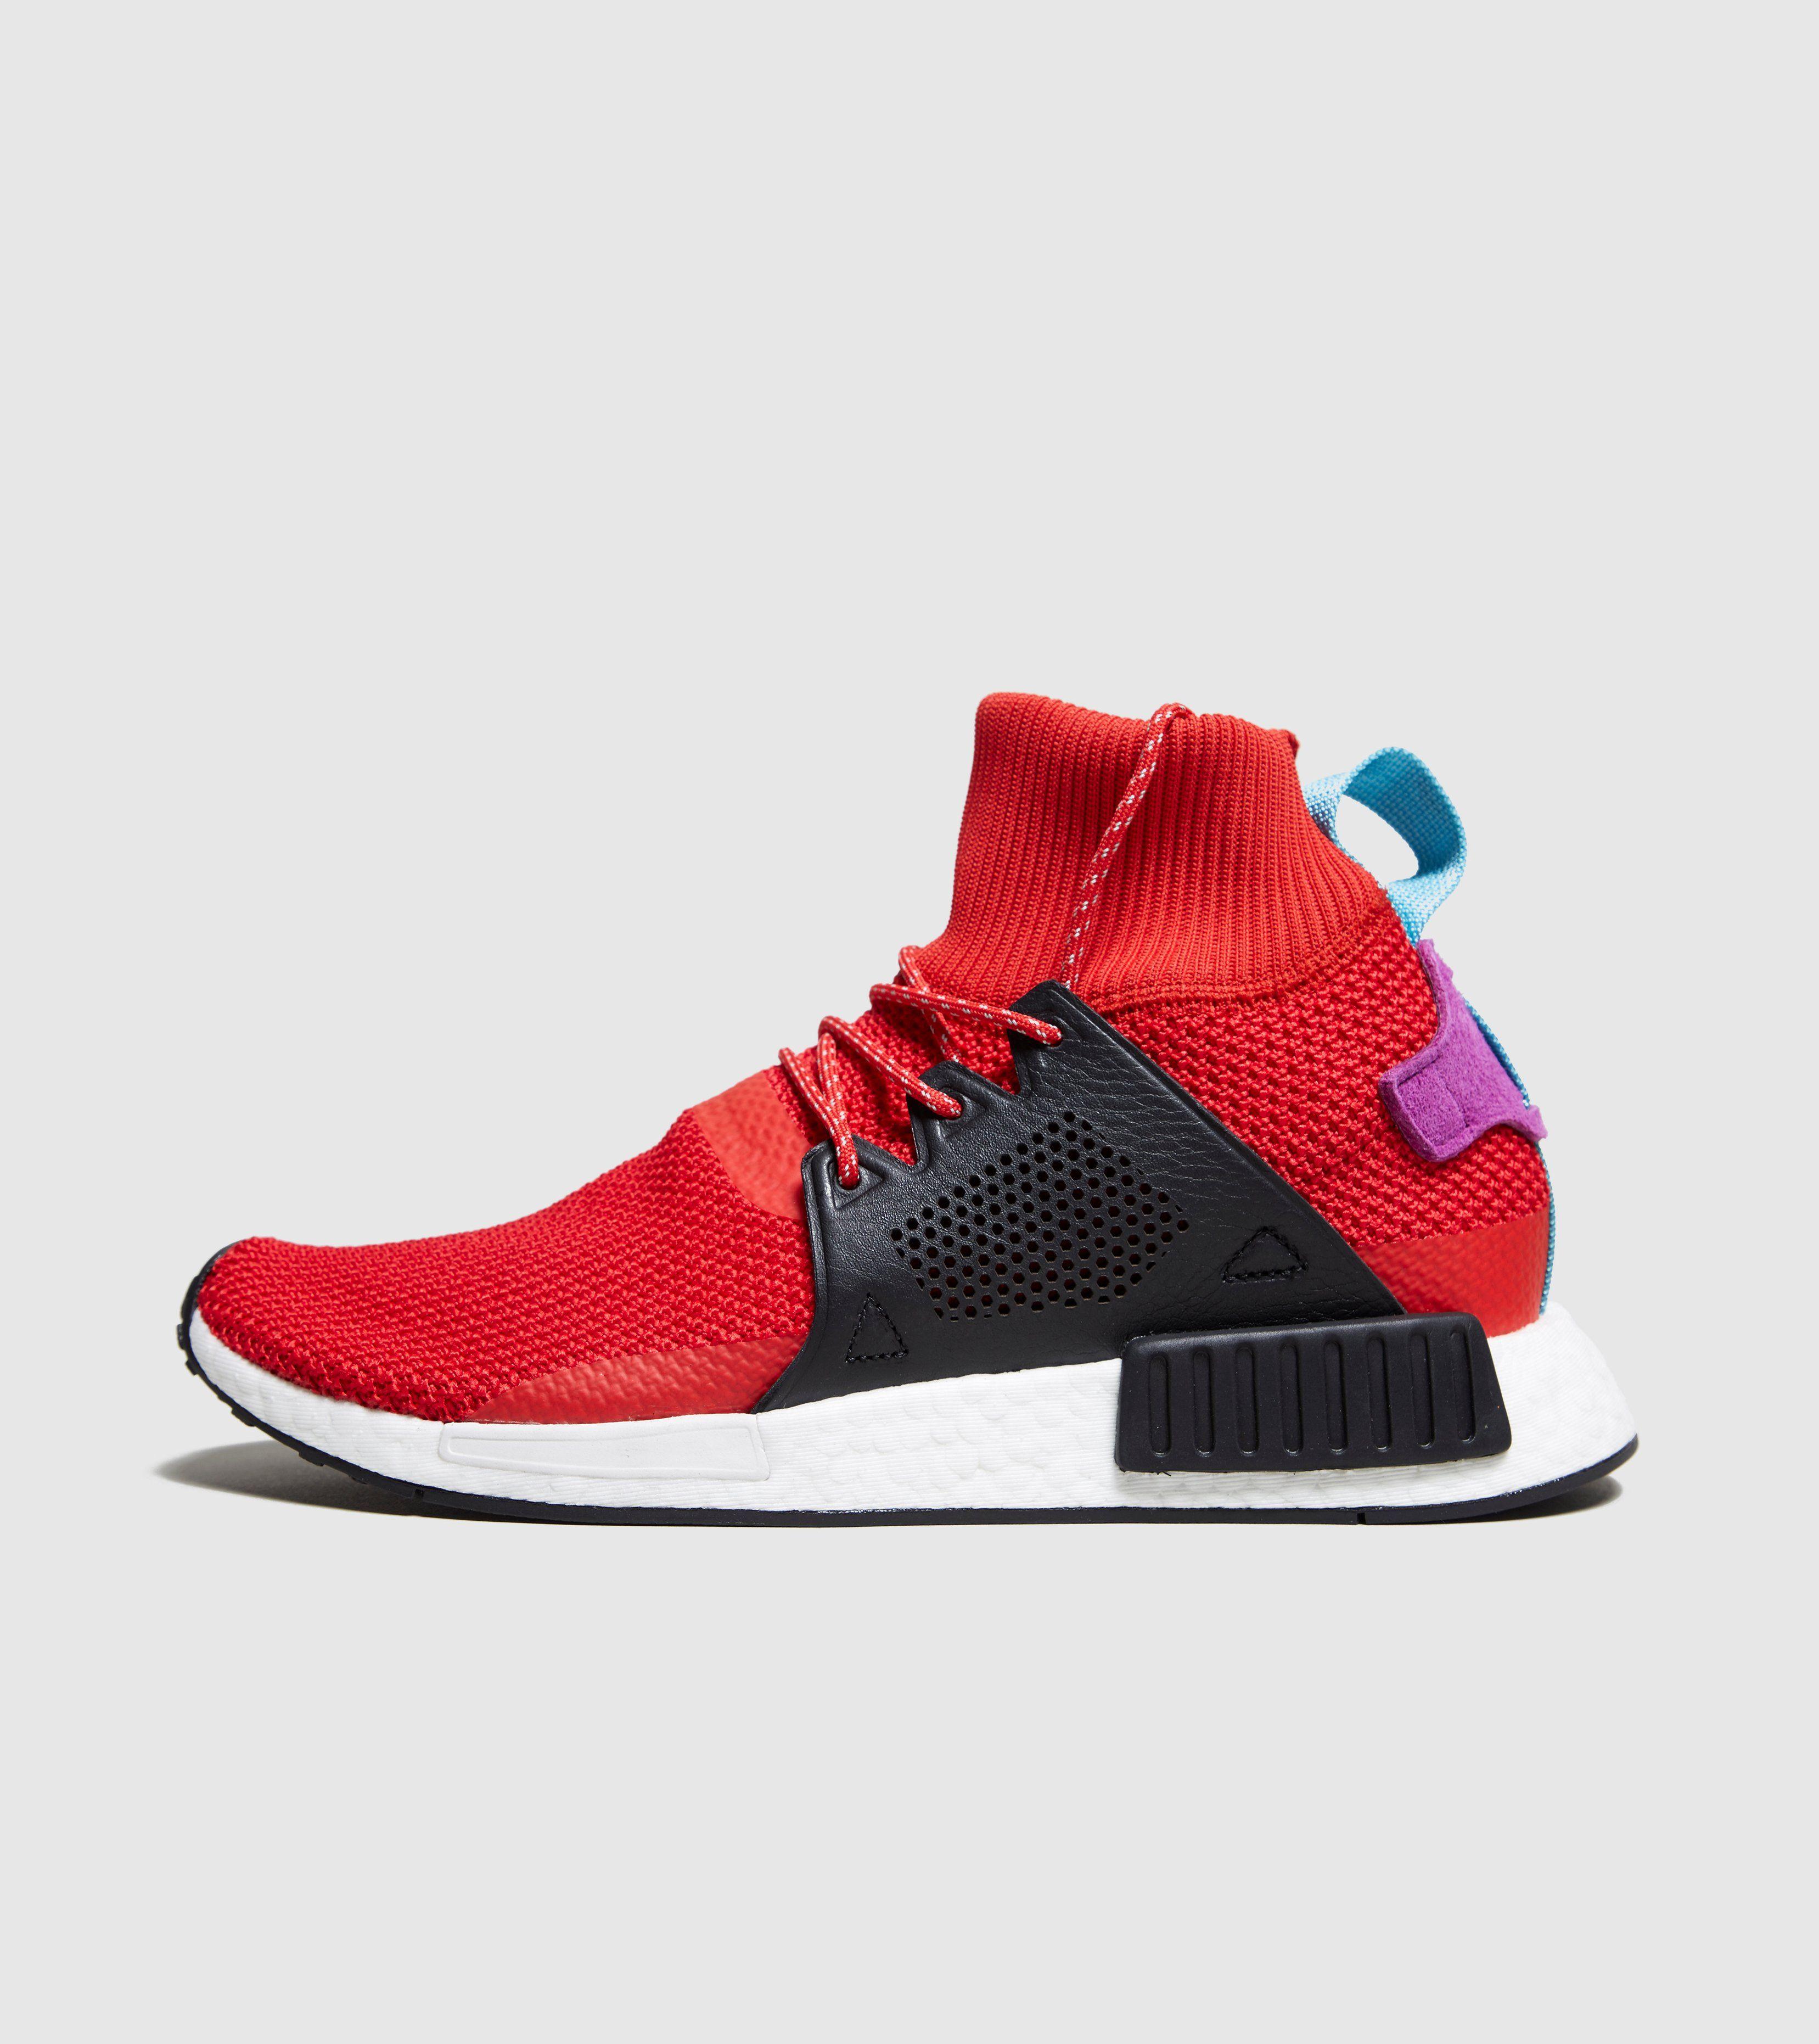 Adidas Originals Nmd Xr1 Winter Size